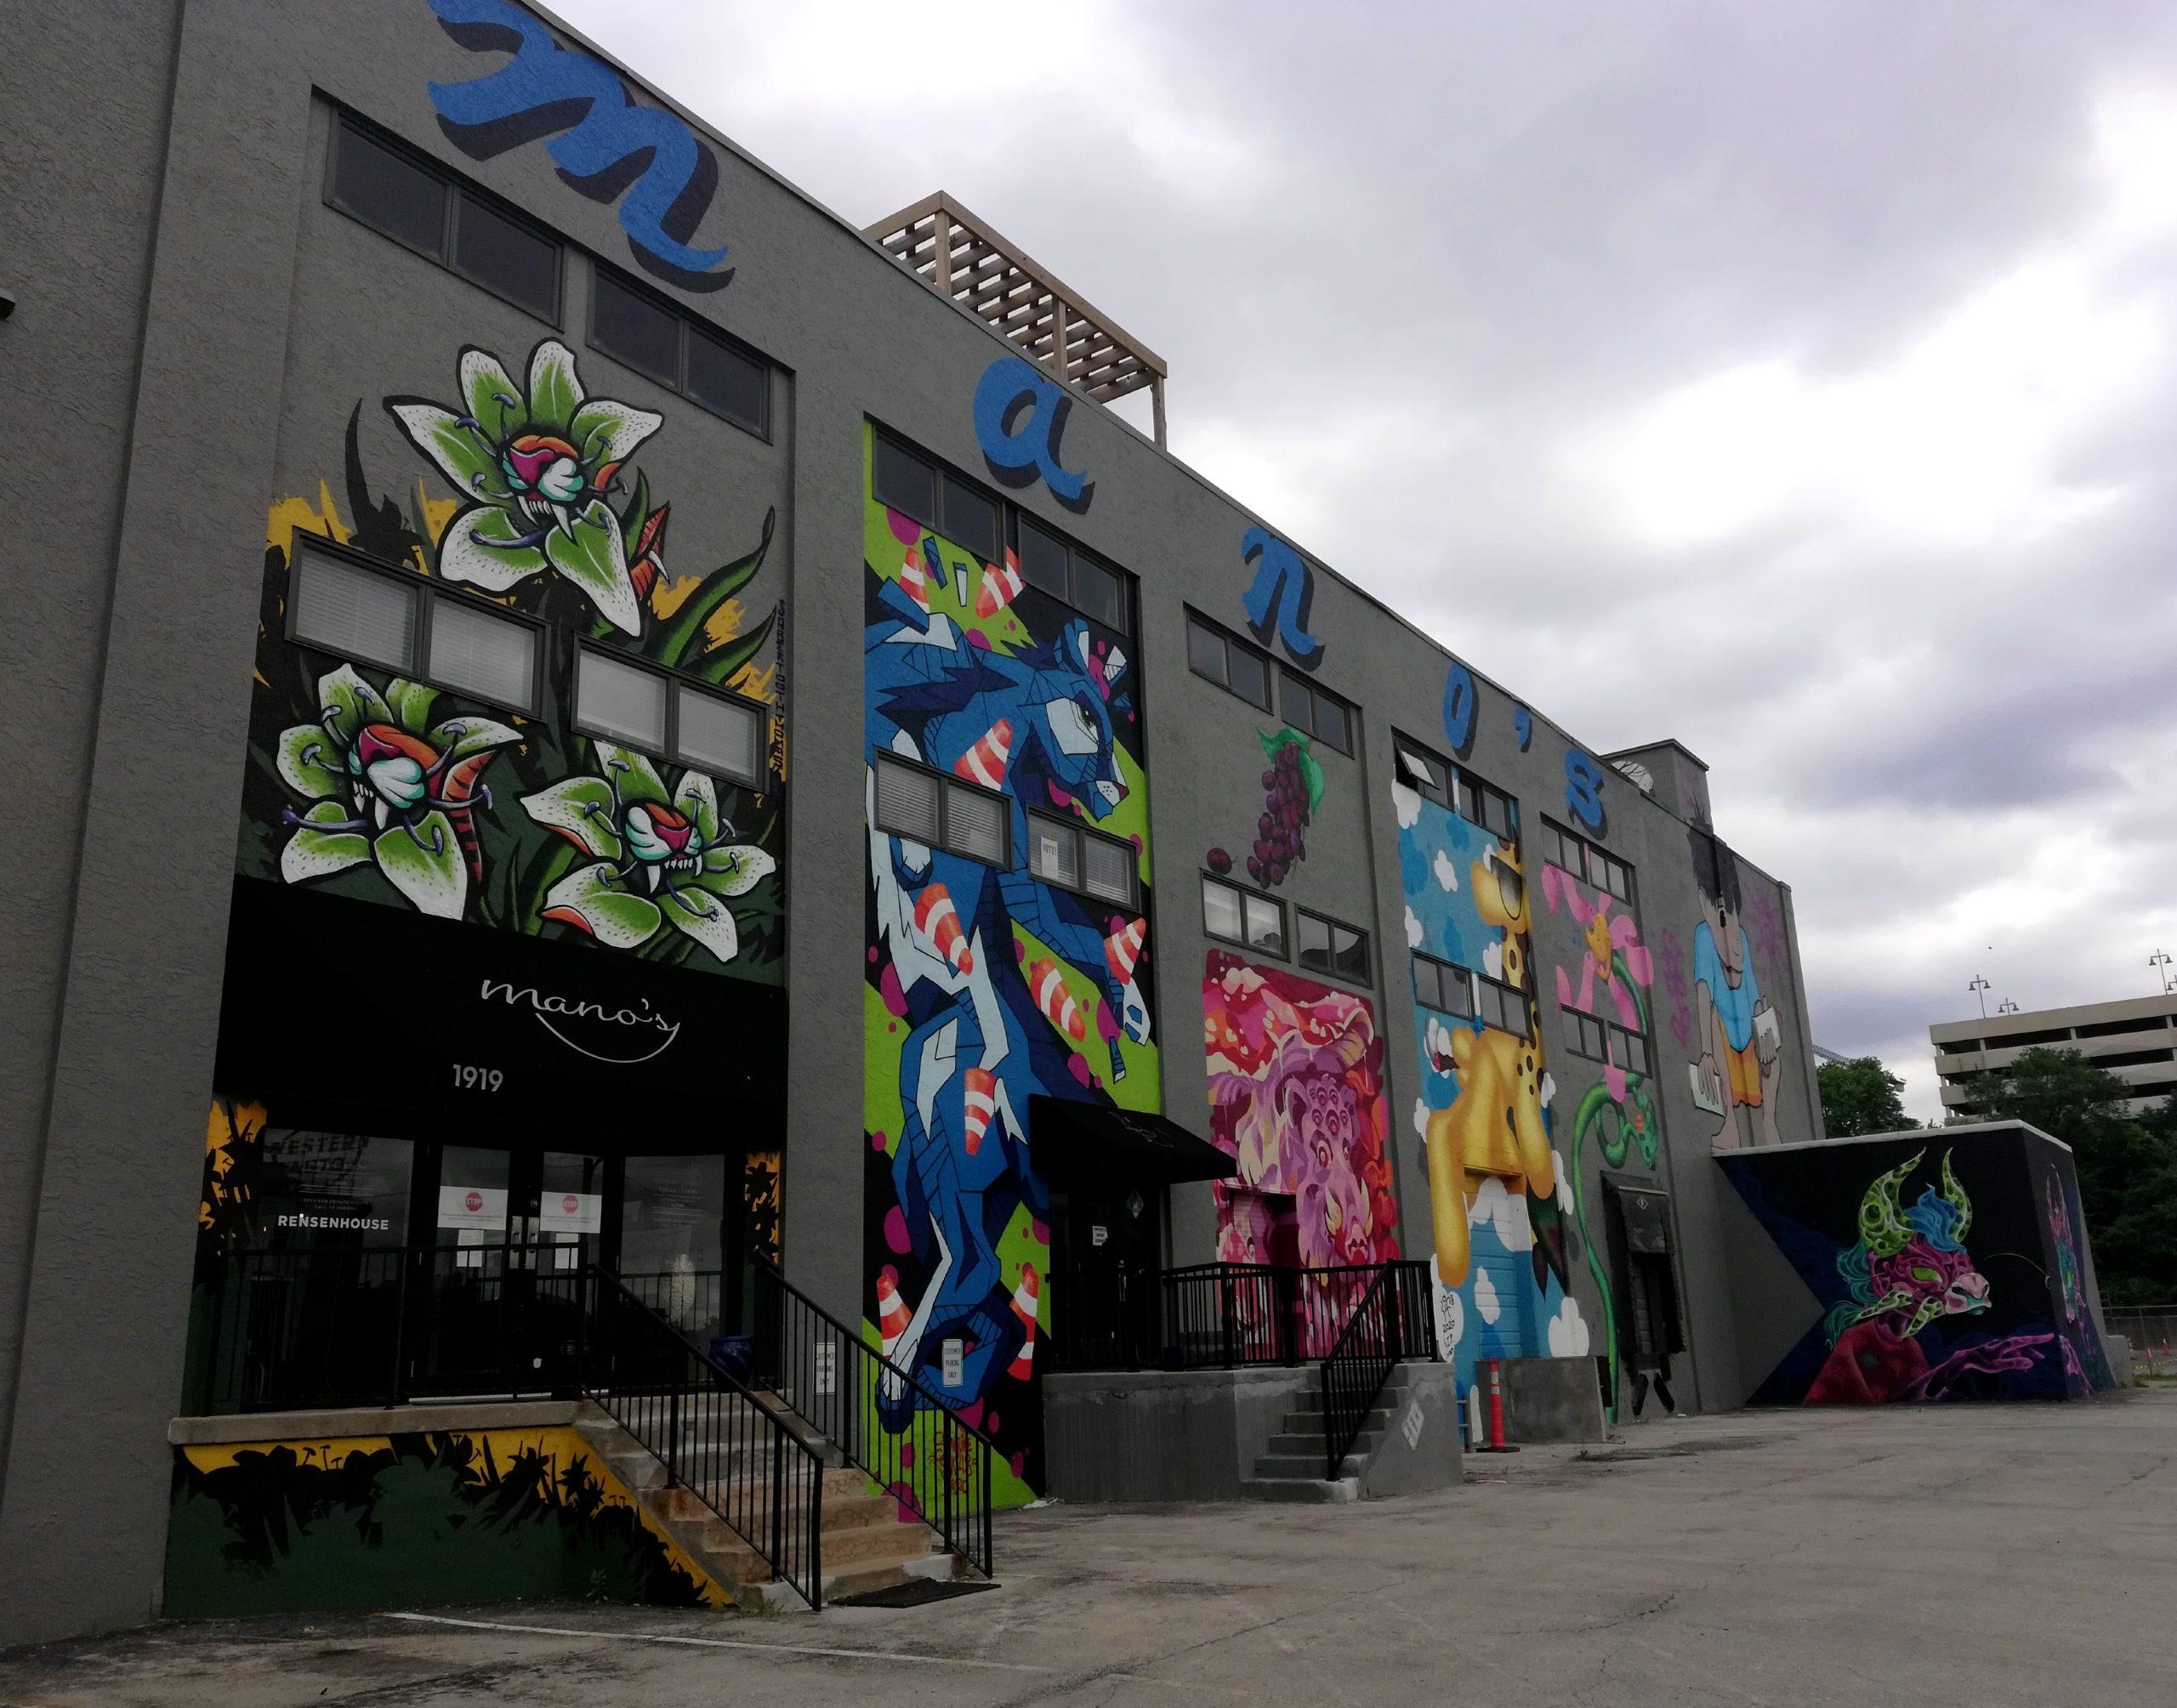 Manos Graffiti Kansas City Street Art KCMO